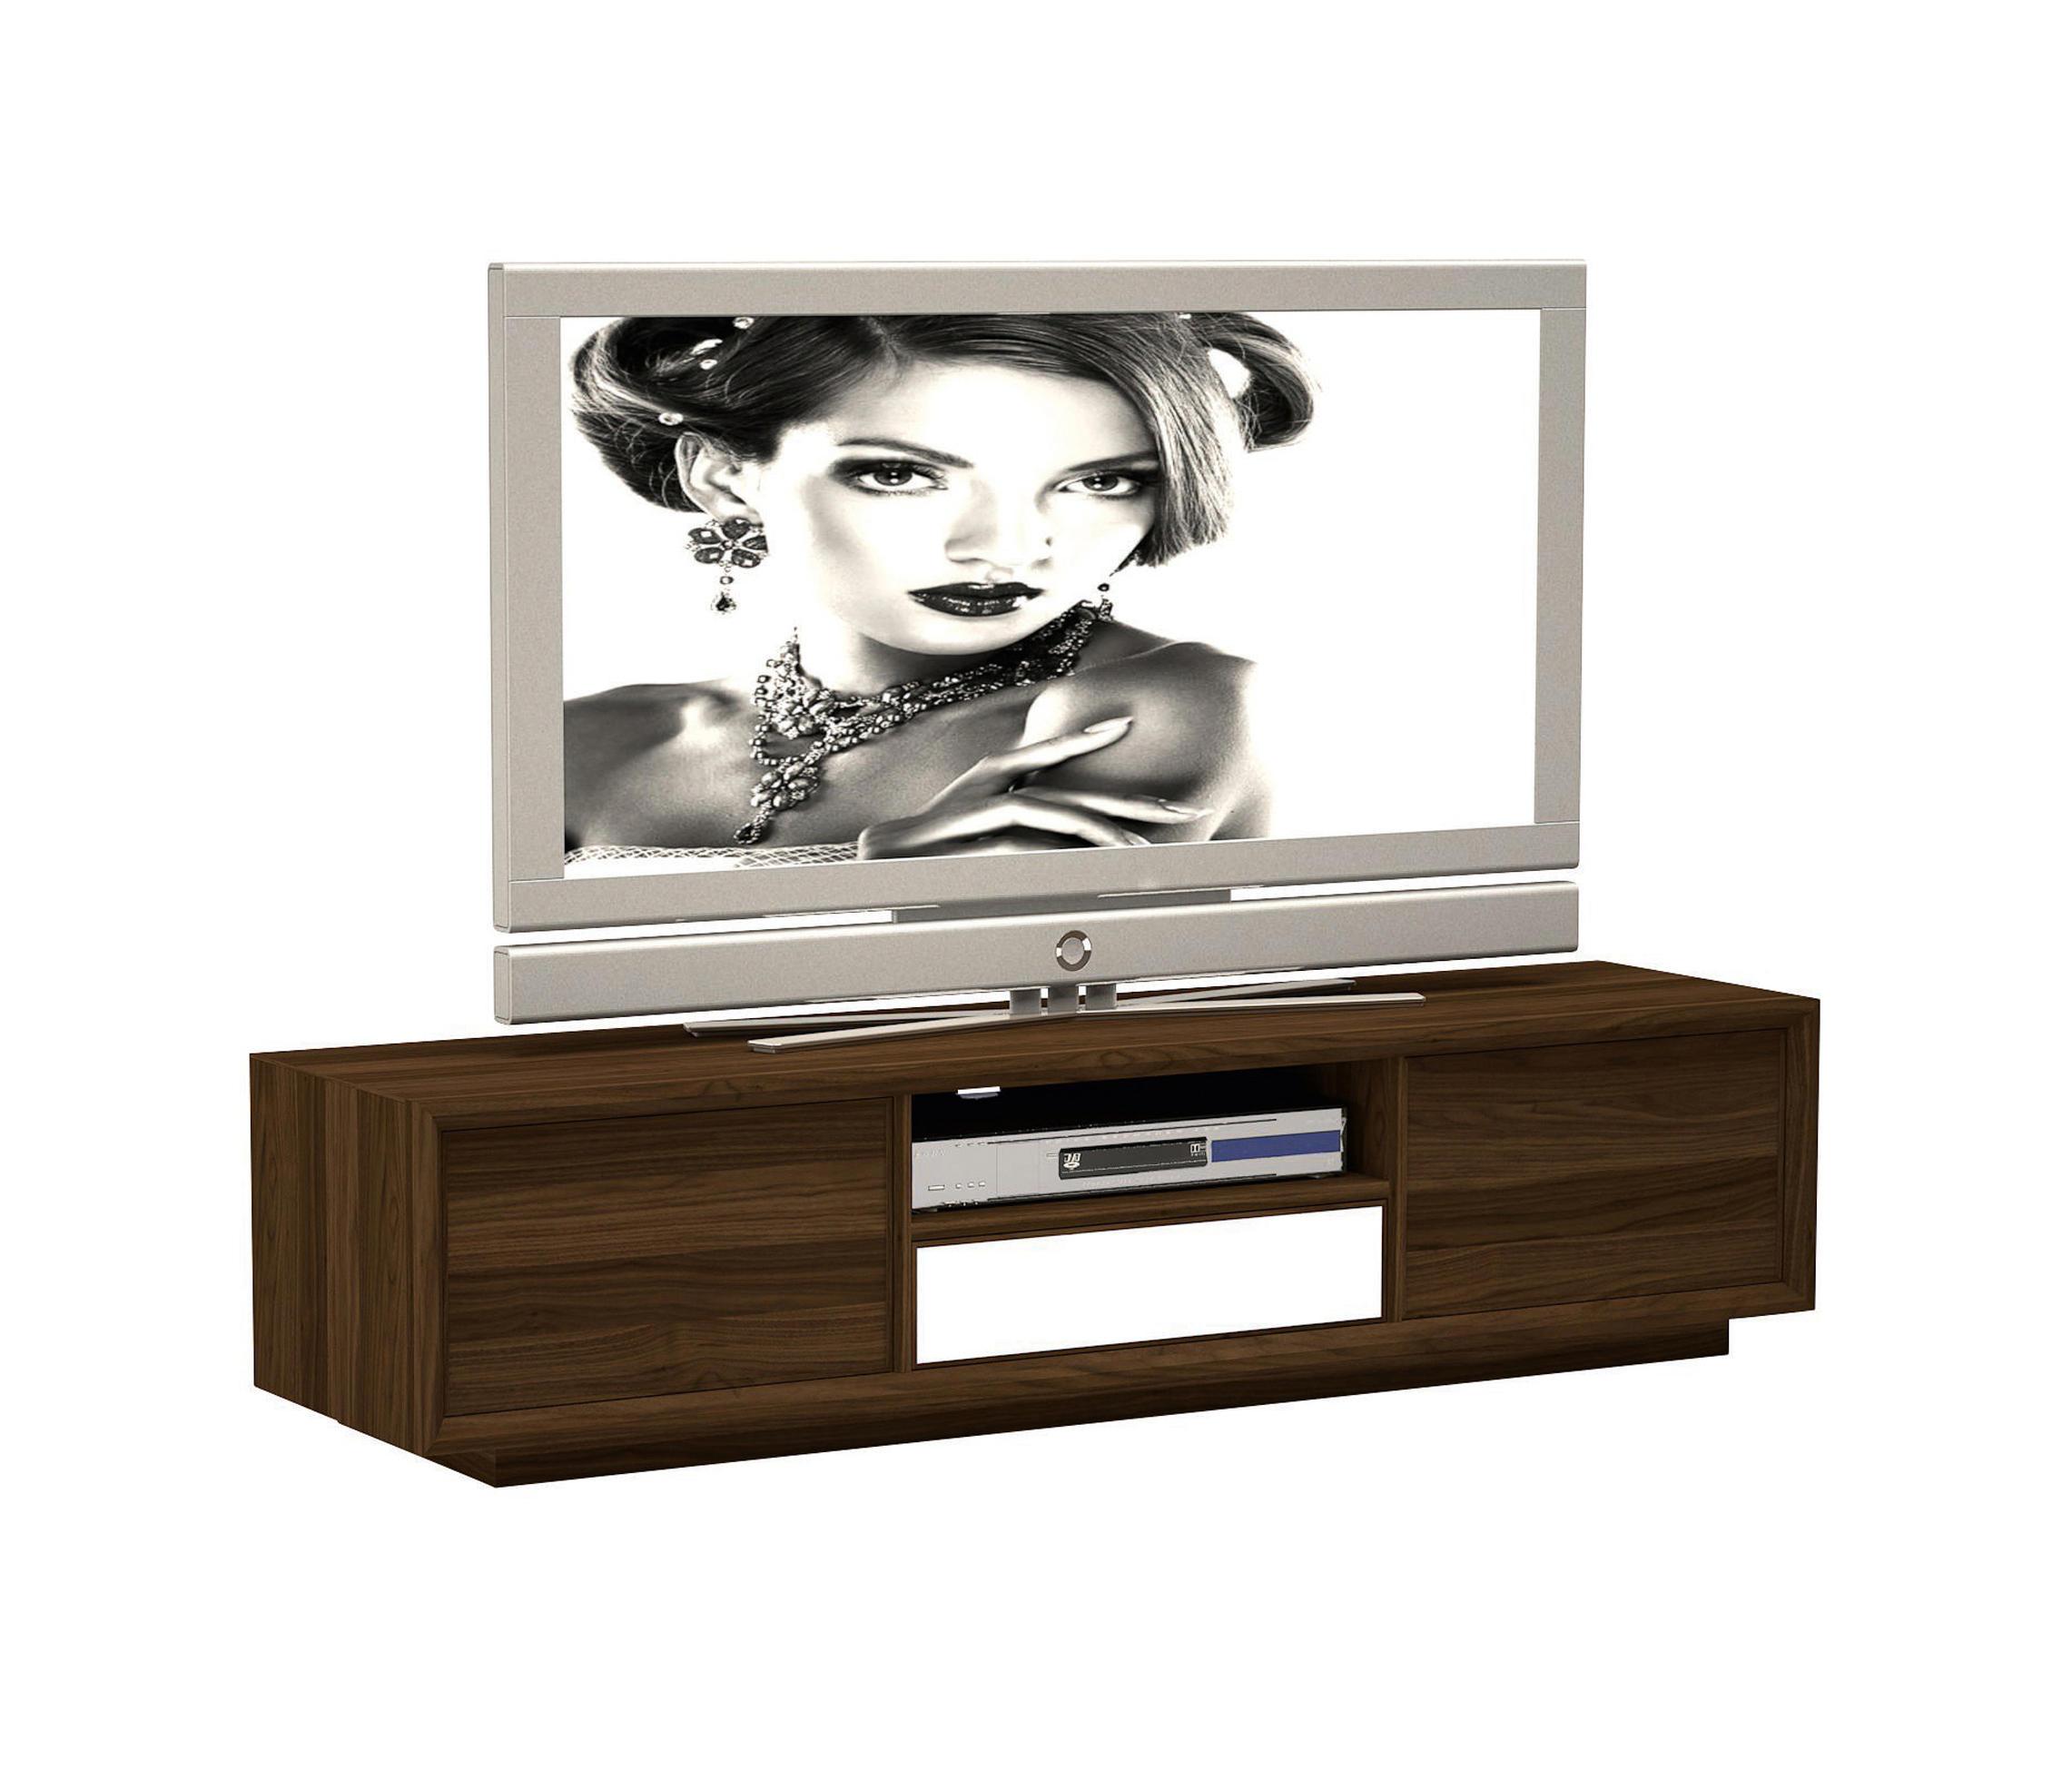 leonardo tv m bel selva timeless multimedia sideboards von selva architonic. Black Bedroom Furniture Sets. Home Design Ideas